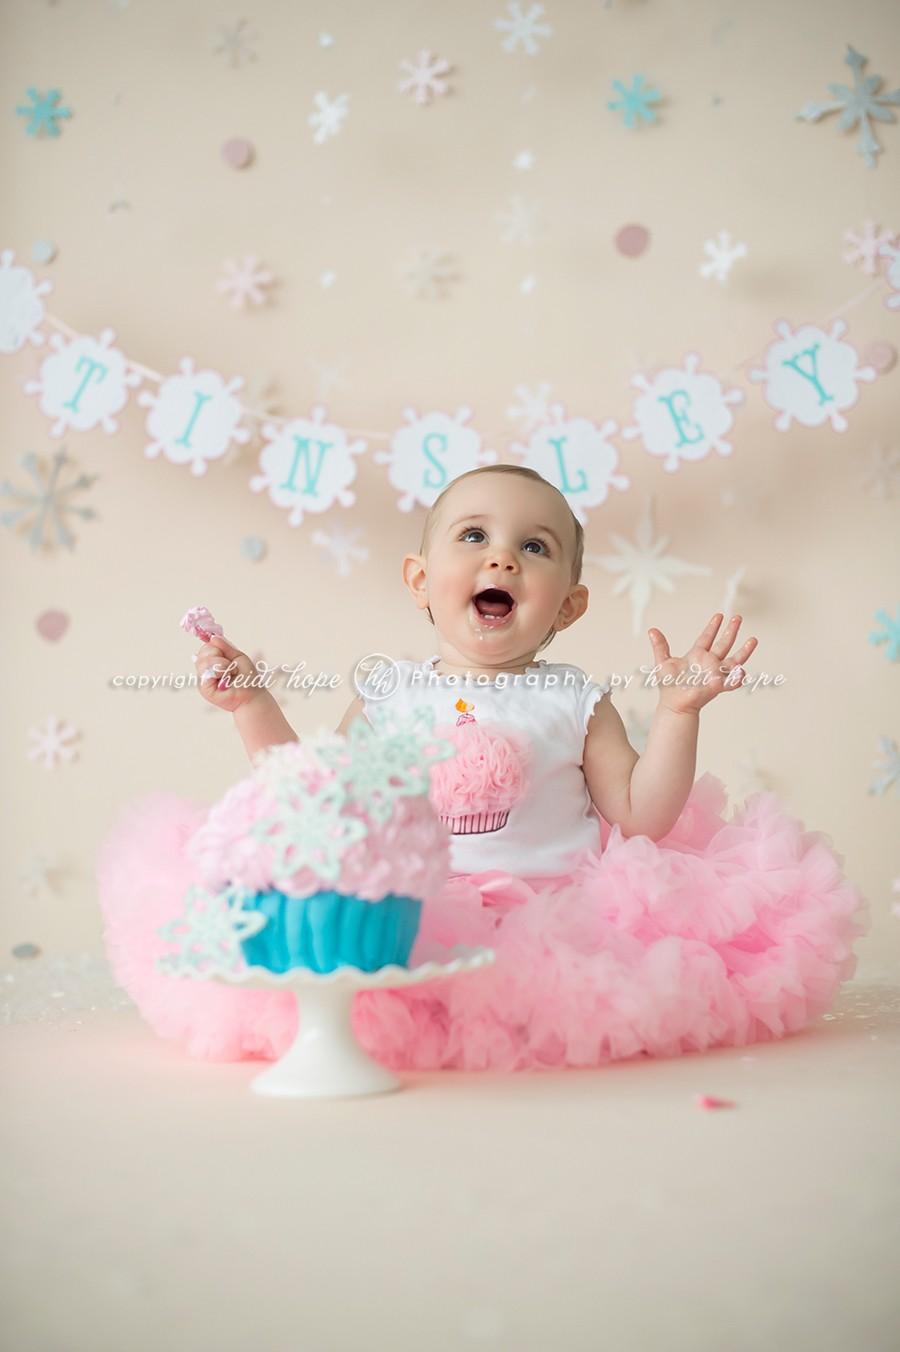 05_first_birthday_cake_smash_photographer_